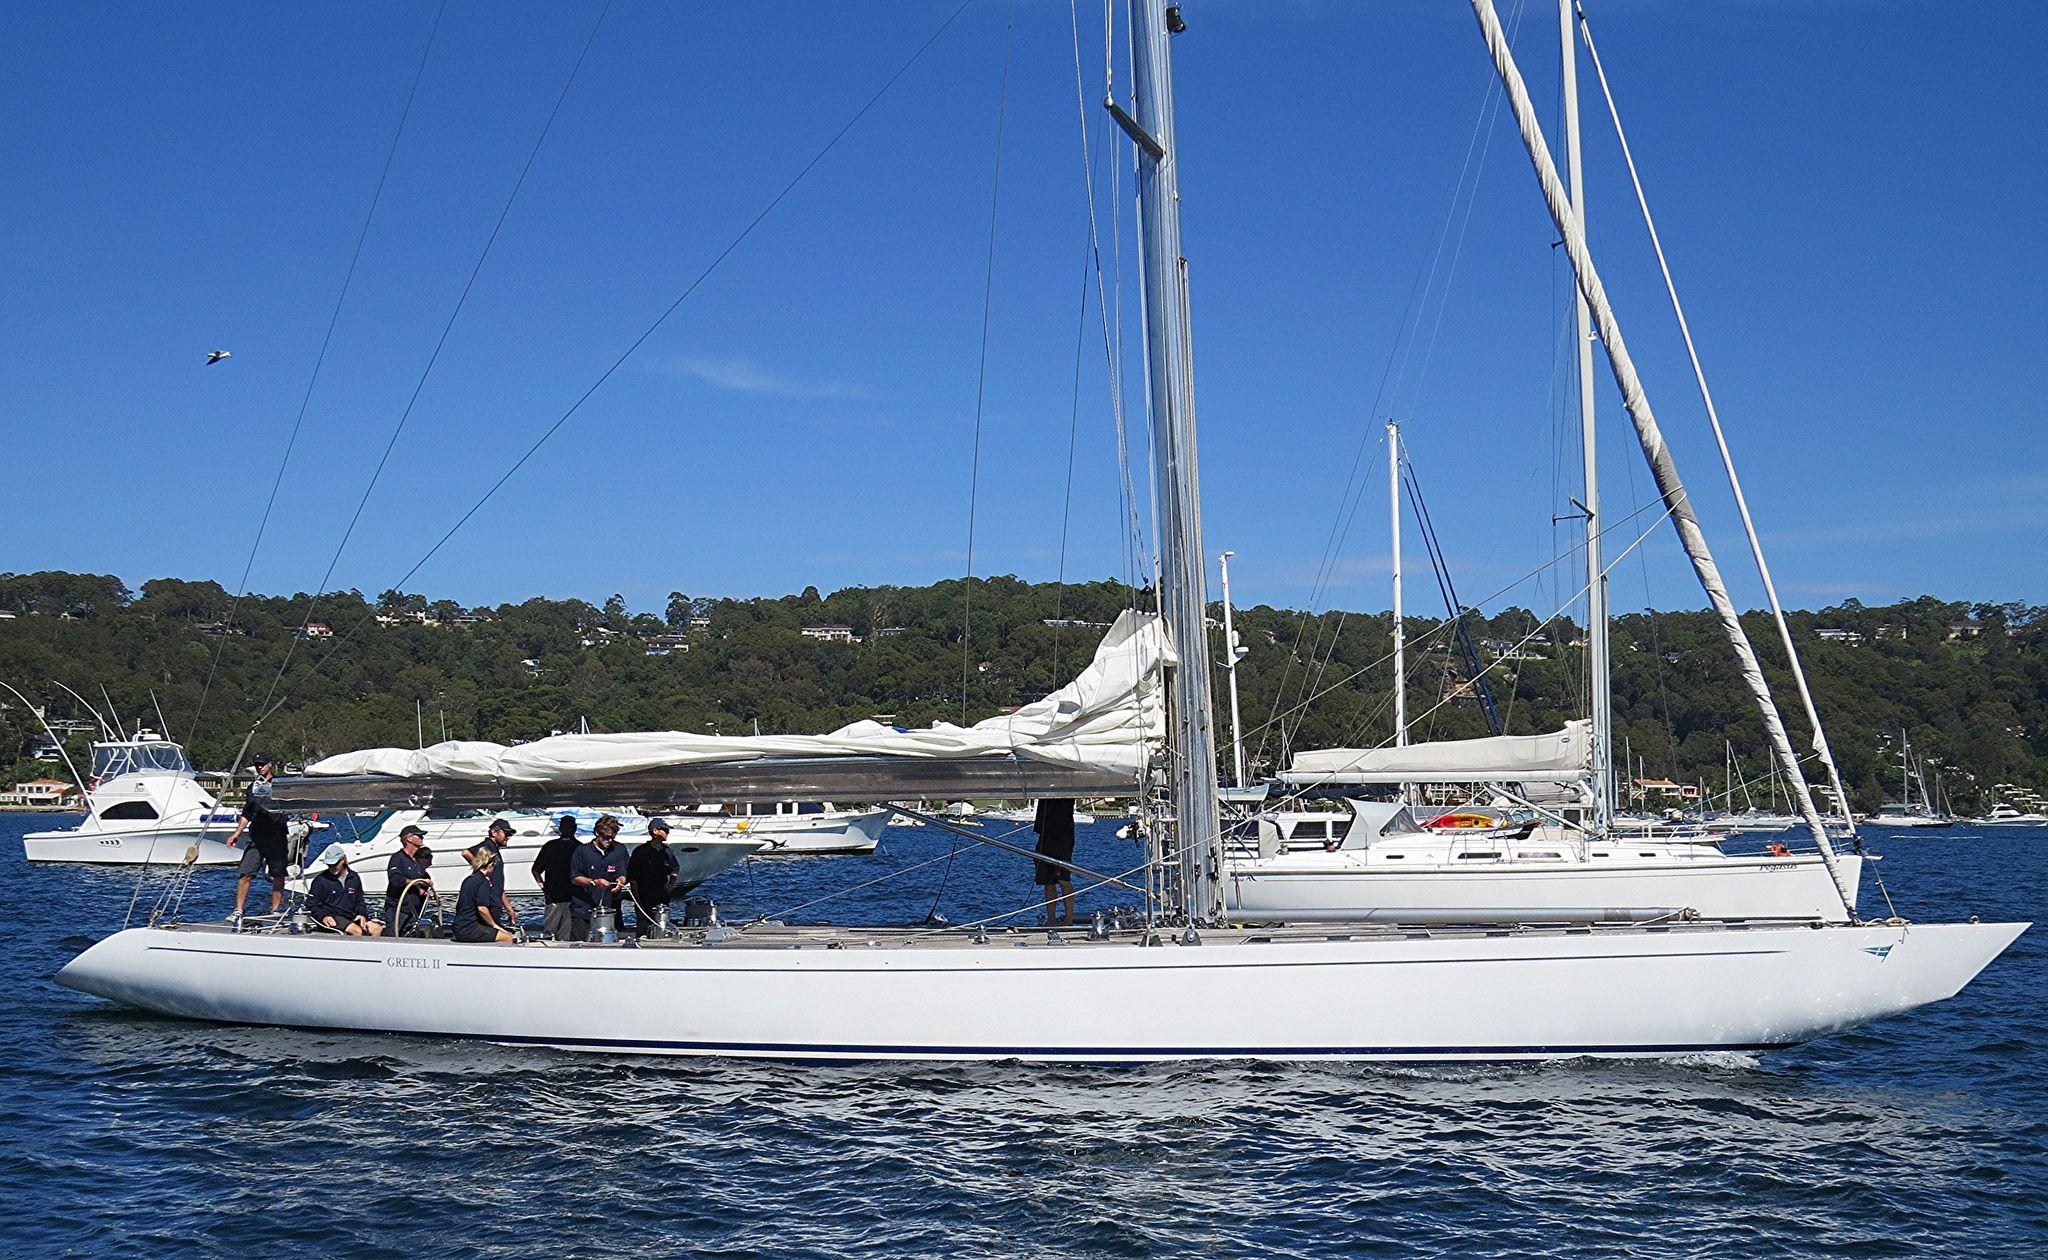 Img_0116001 gretel 11 in 2020 yacht design classic